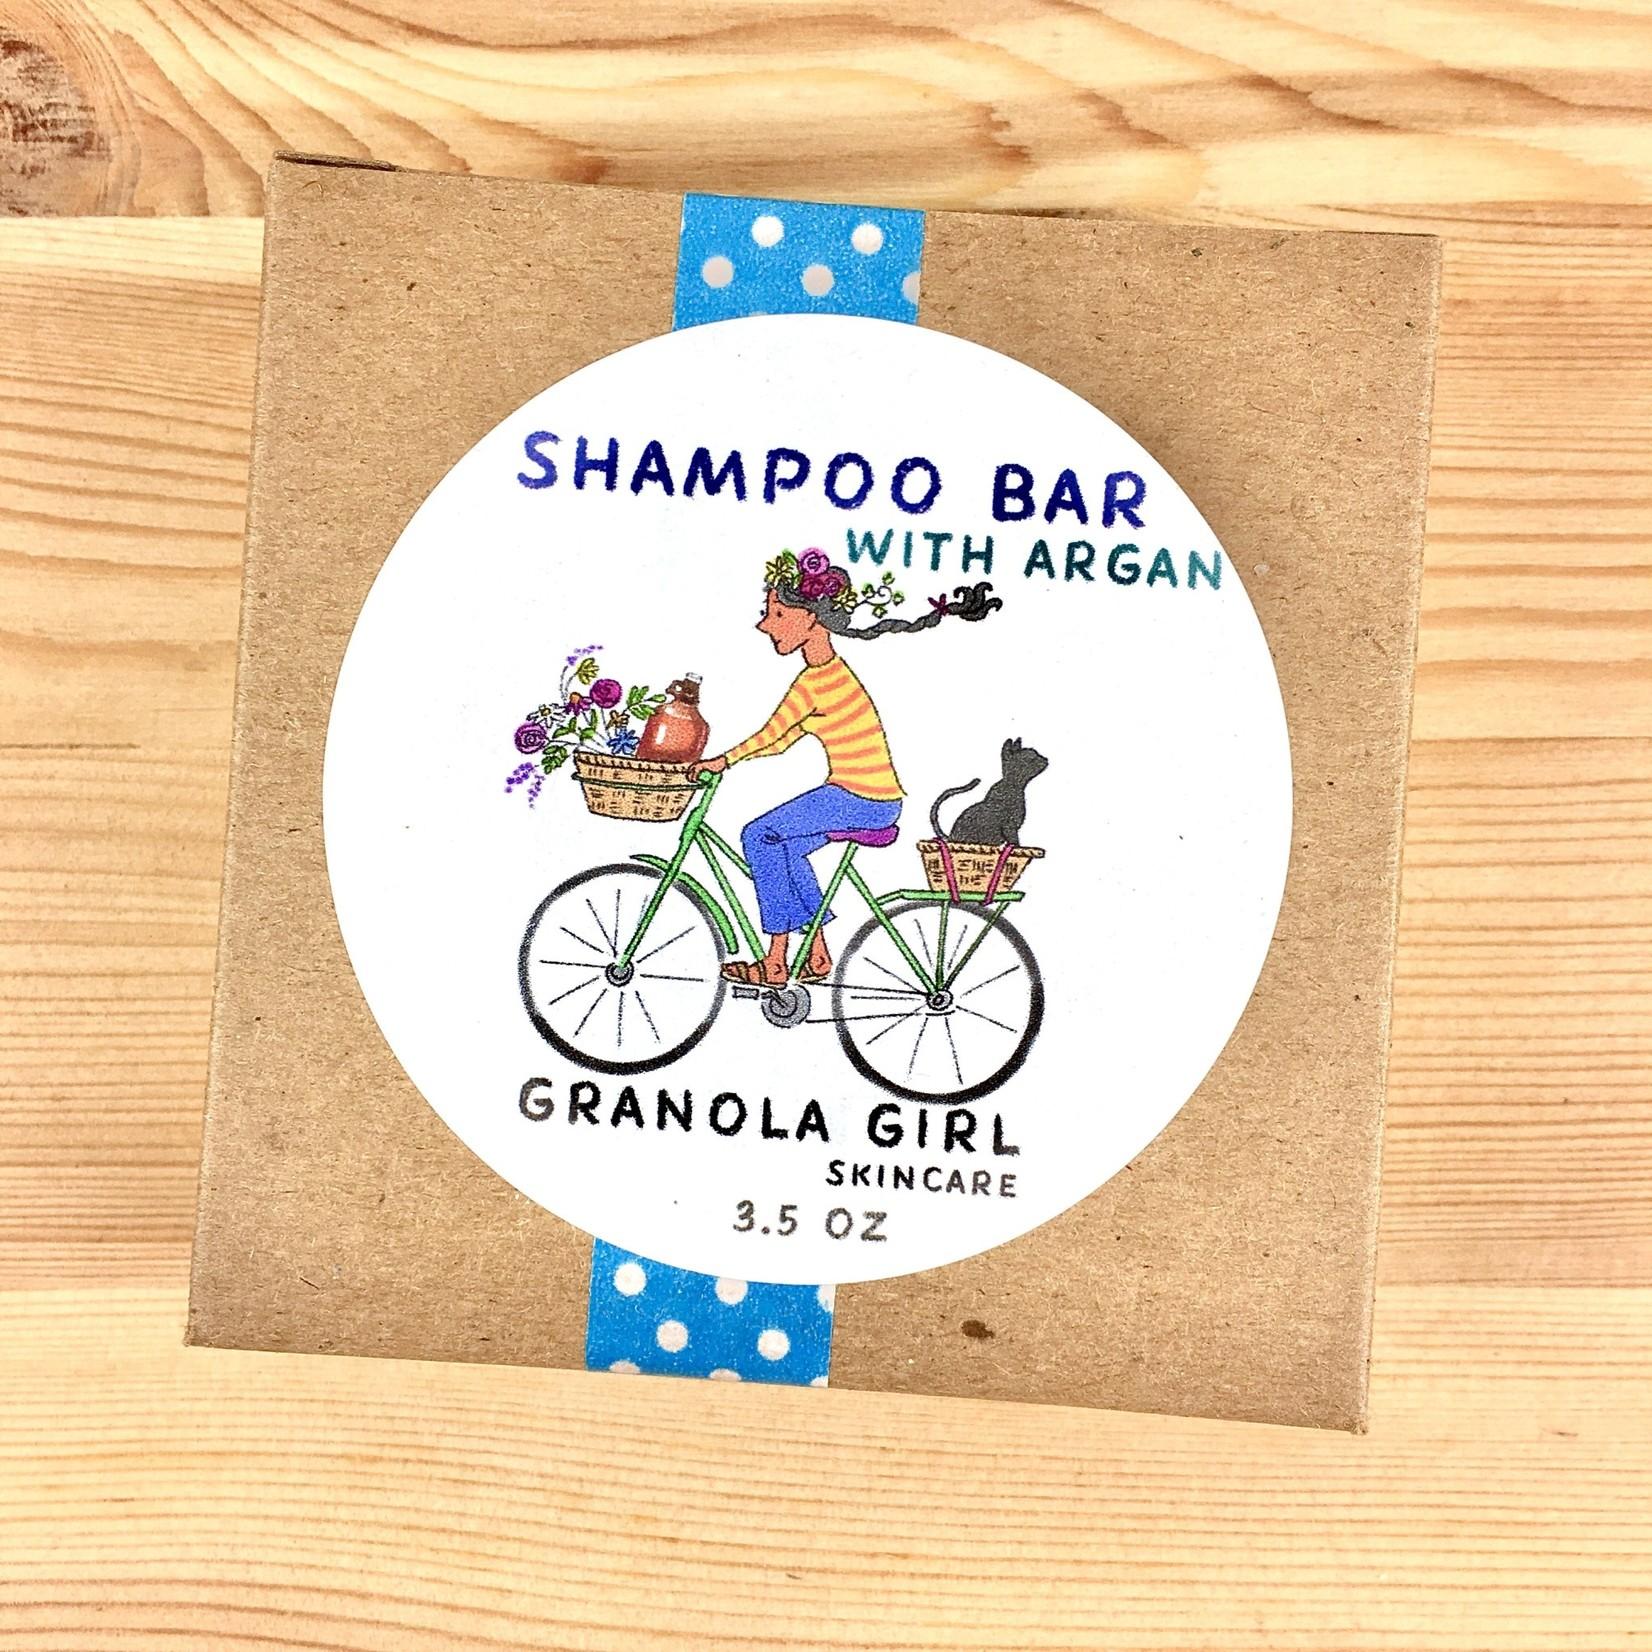 Granola Girl Skincare /Teehaus Bath + Body (QO) Rosemary Peppermint + Argan Shampoo Bar